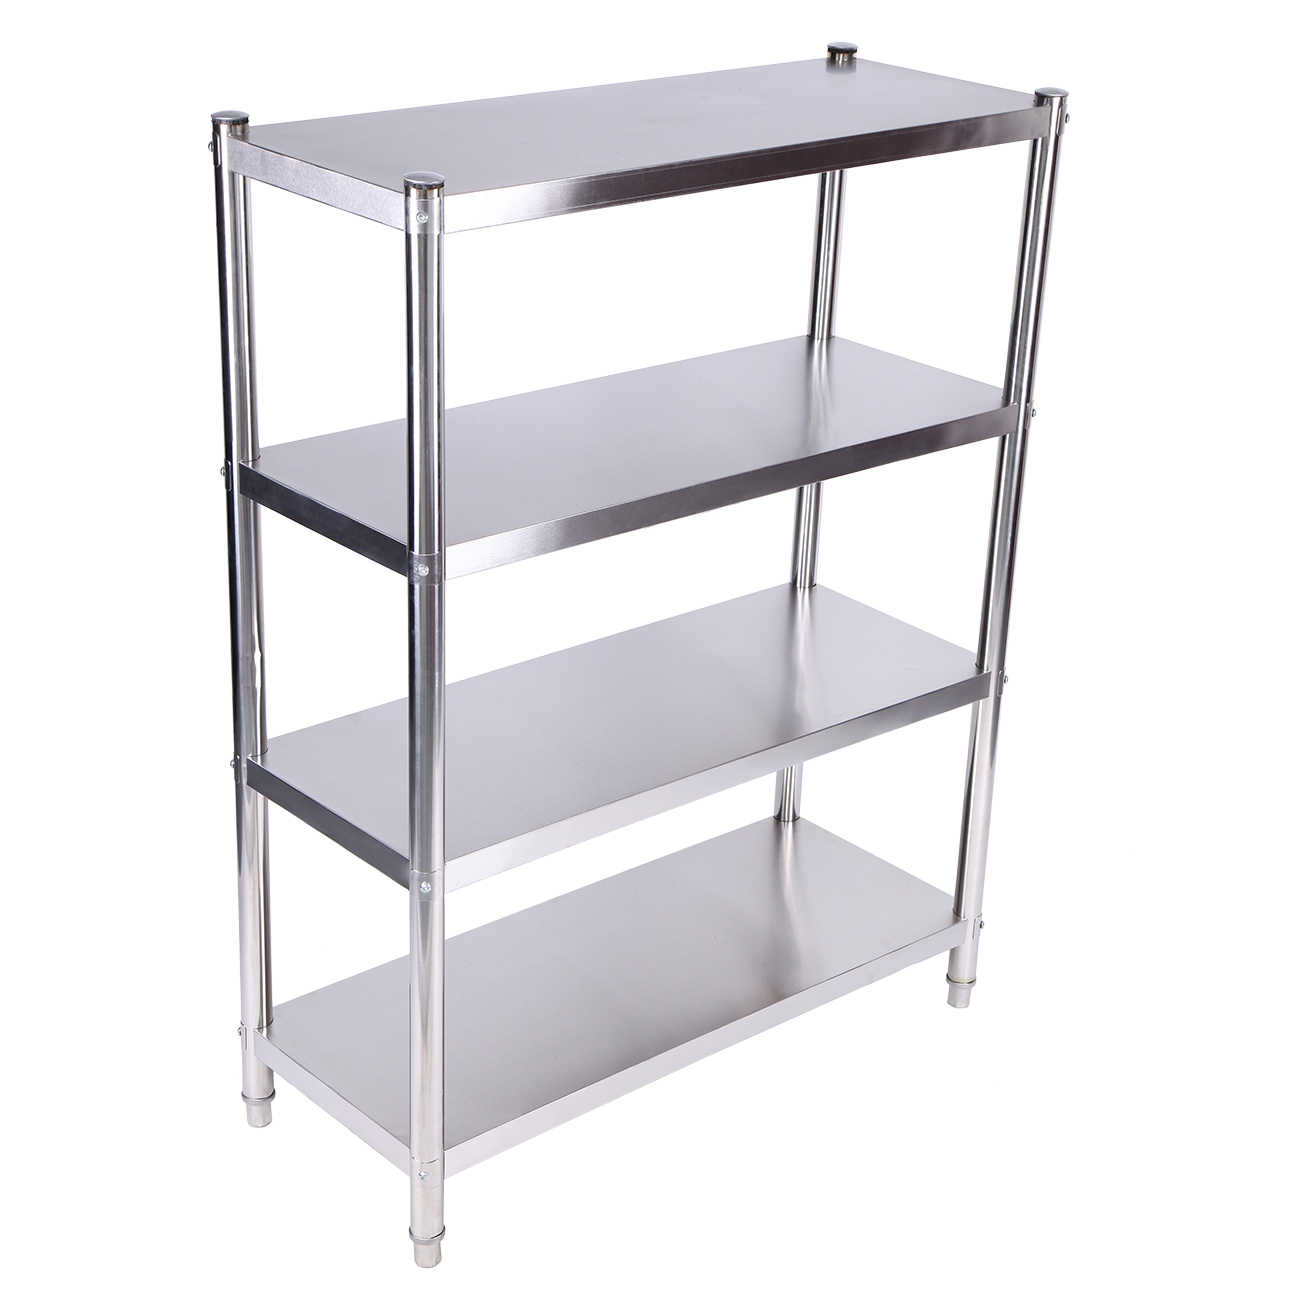 Picture of: Yonntech 4 Tier Storage Rack Shelf Stainless Steel Commercial Kitchen Kitchen Islands Trolleys Aliexpress